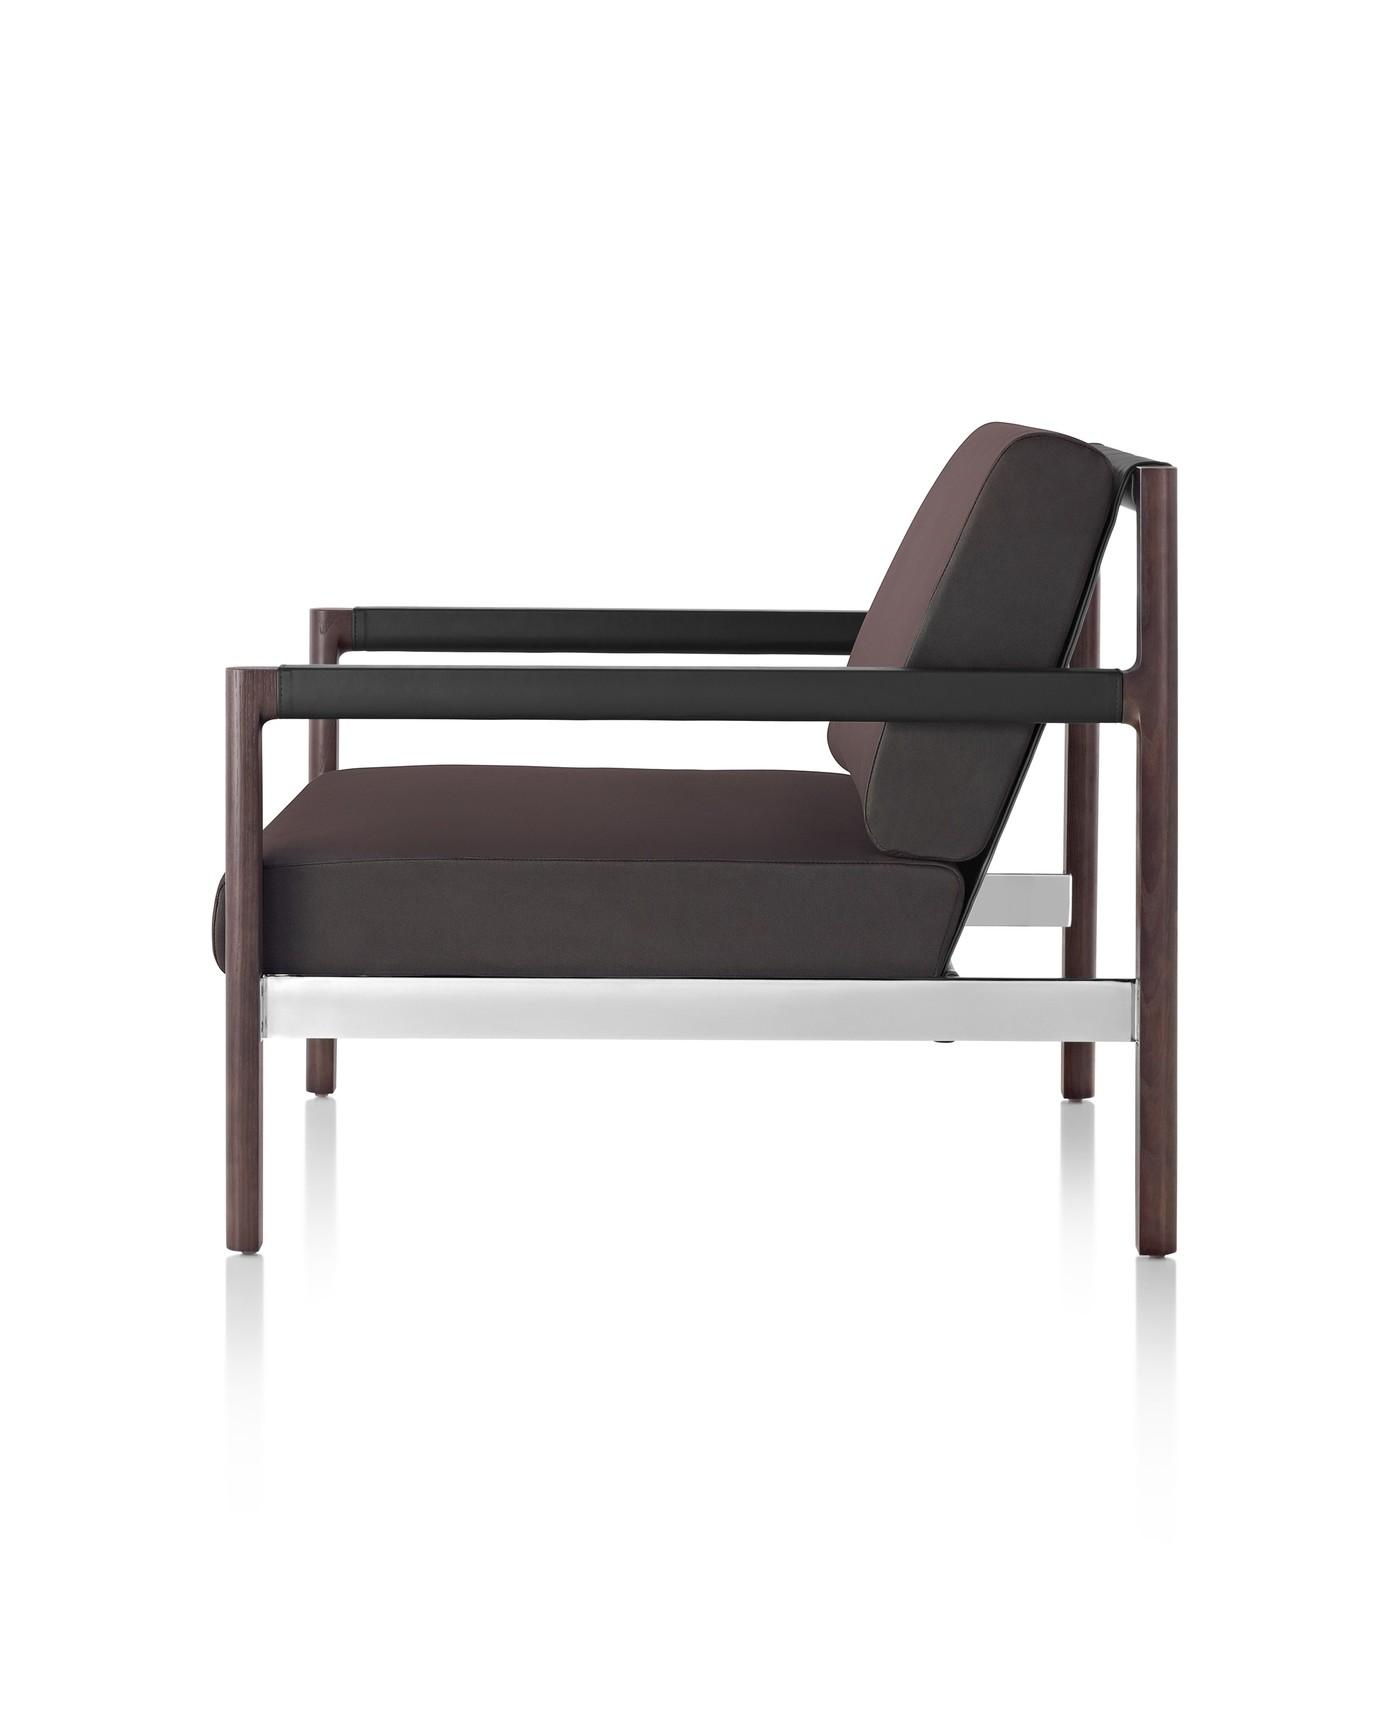 4-Silla-Lounge-Brabo-Lateral-1380